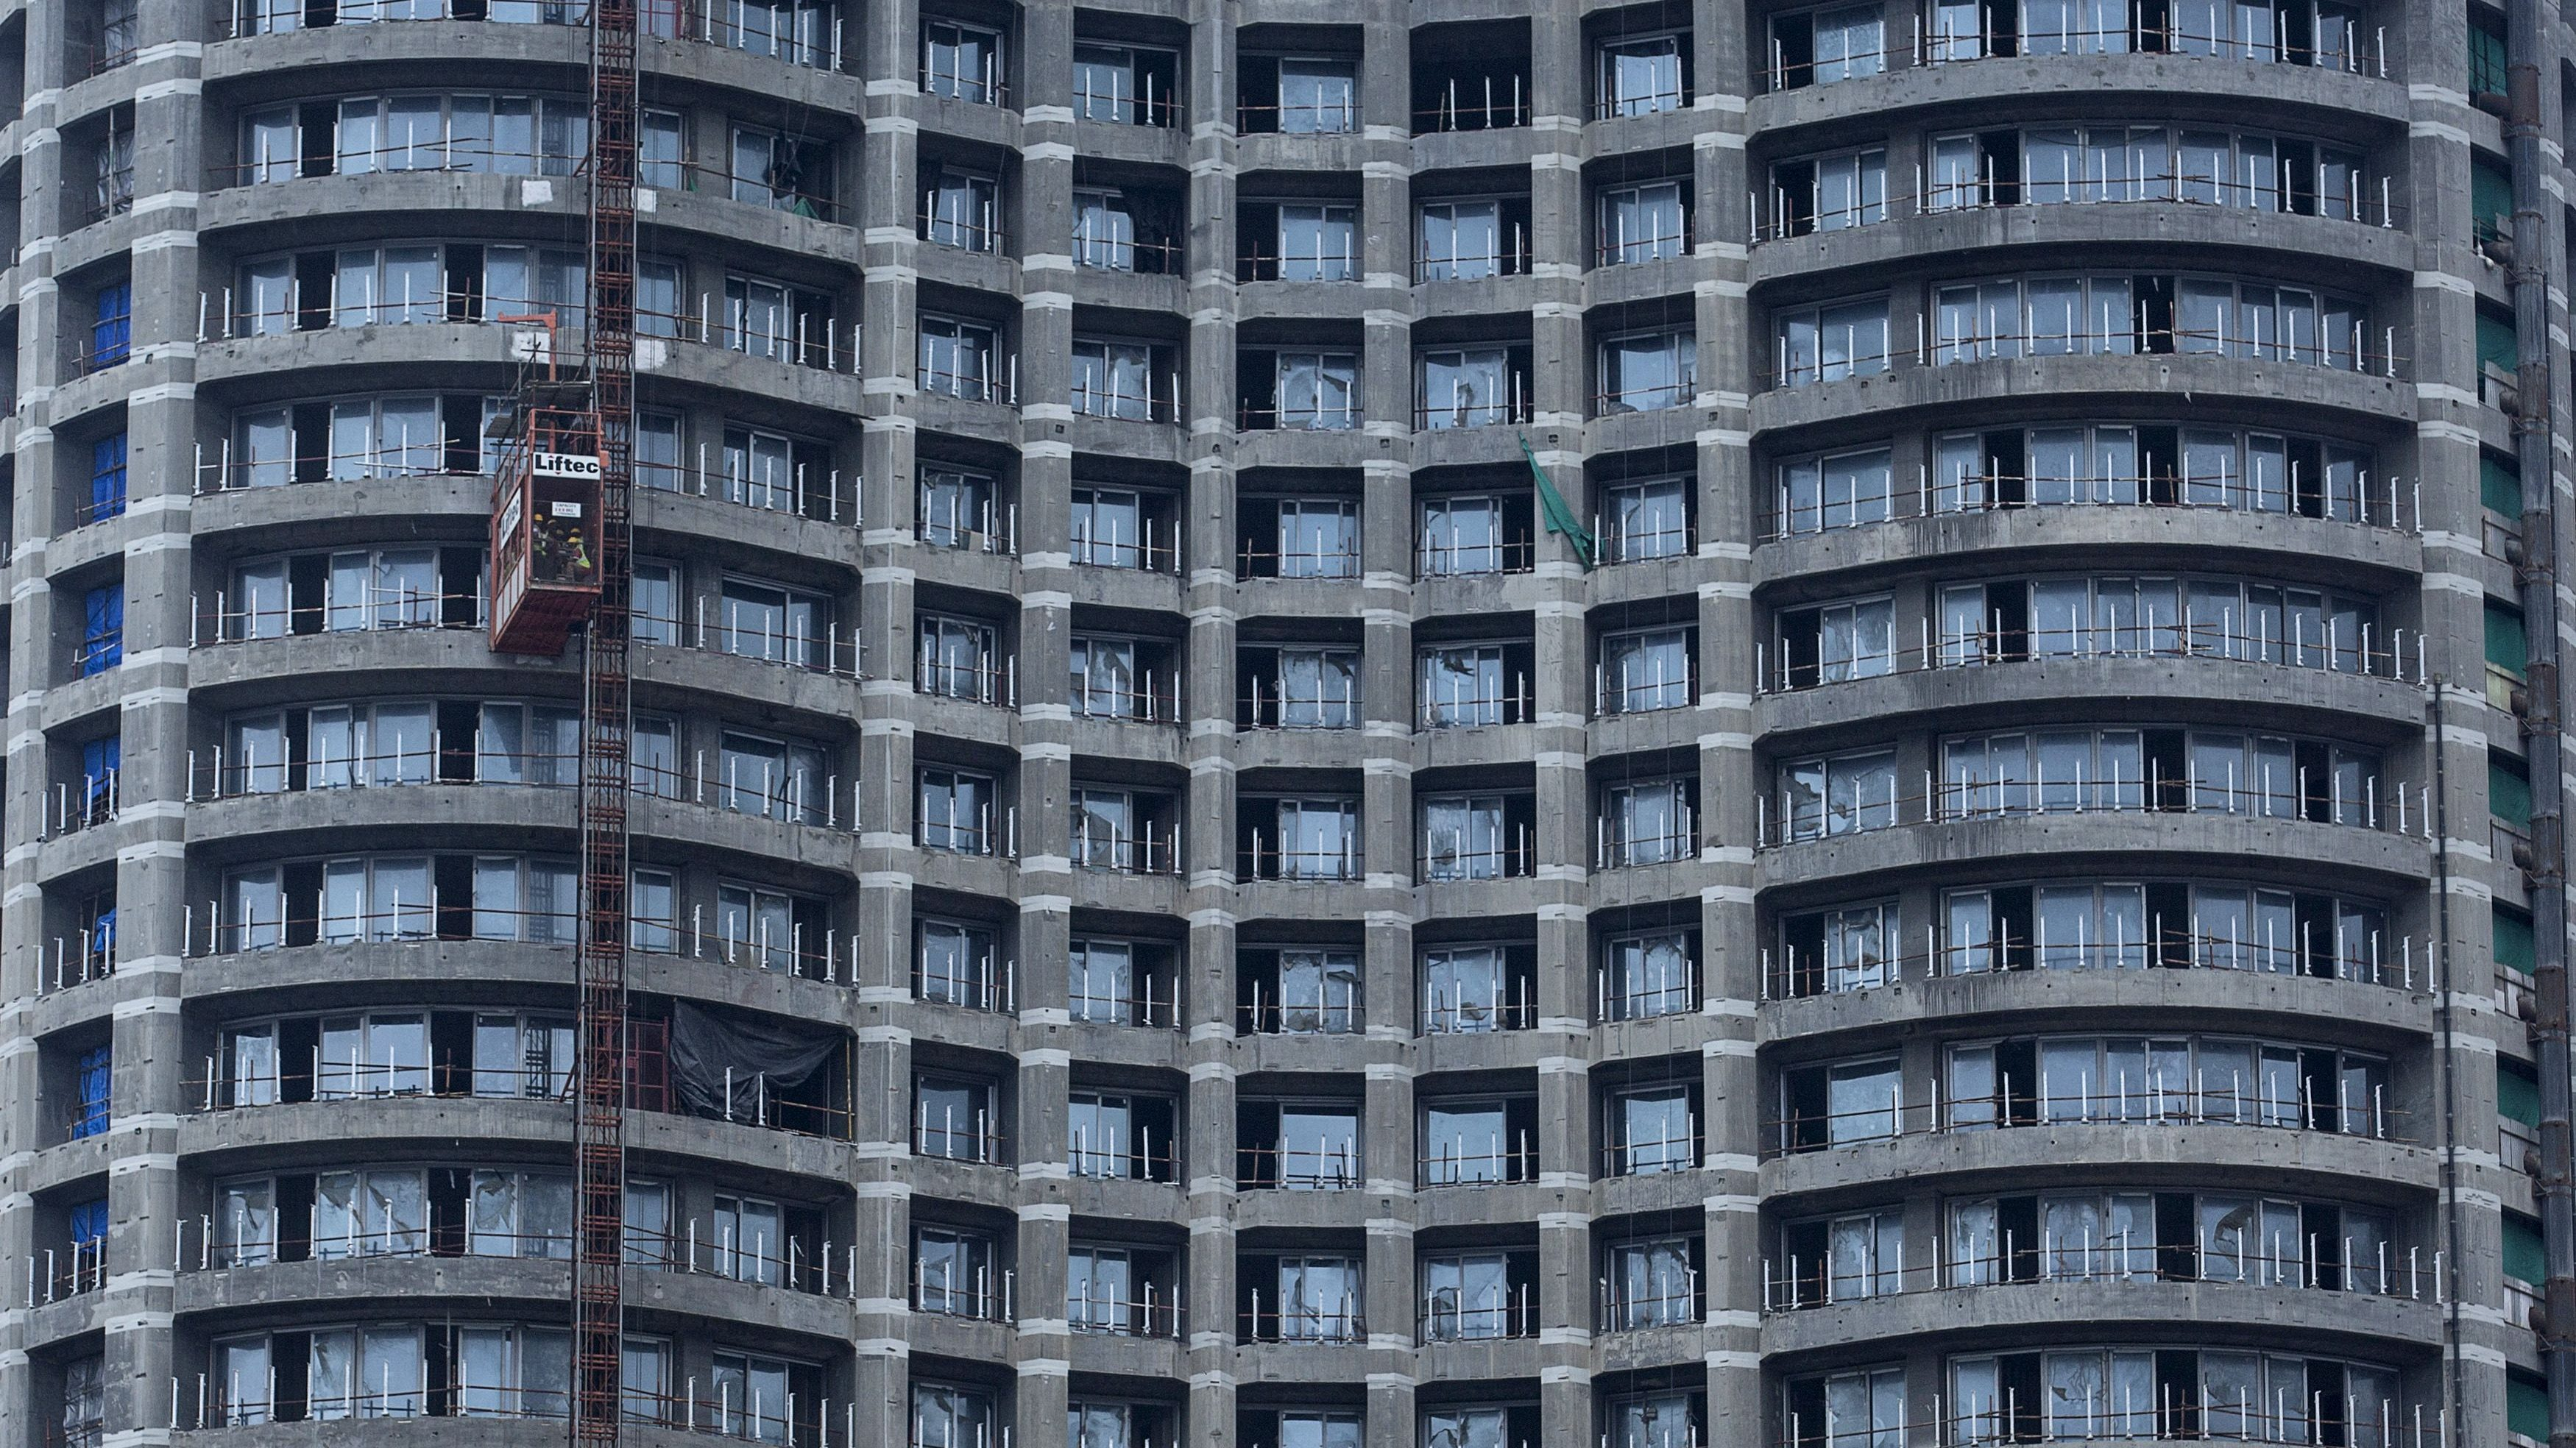 Wider Image: Renting in Mumbai Per Square Foot